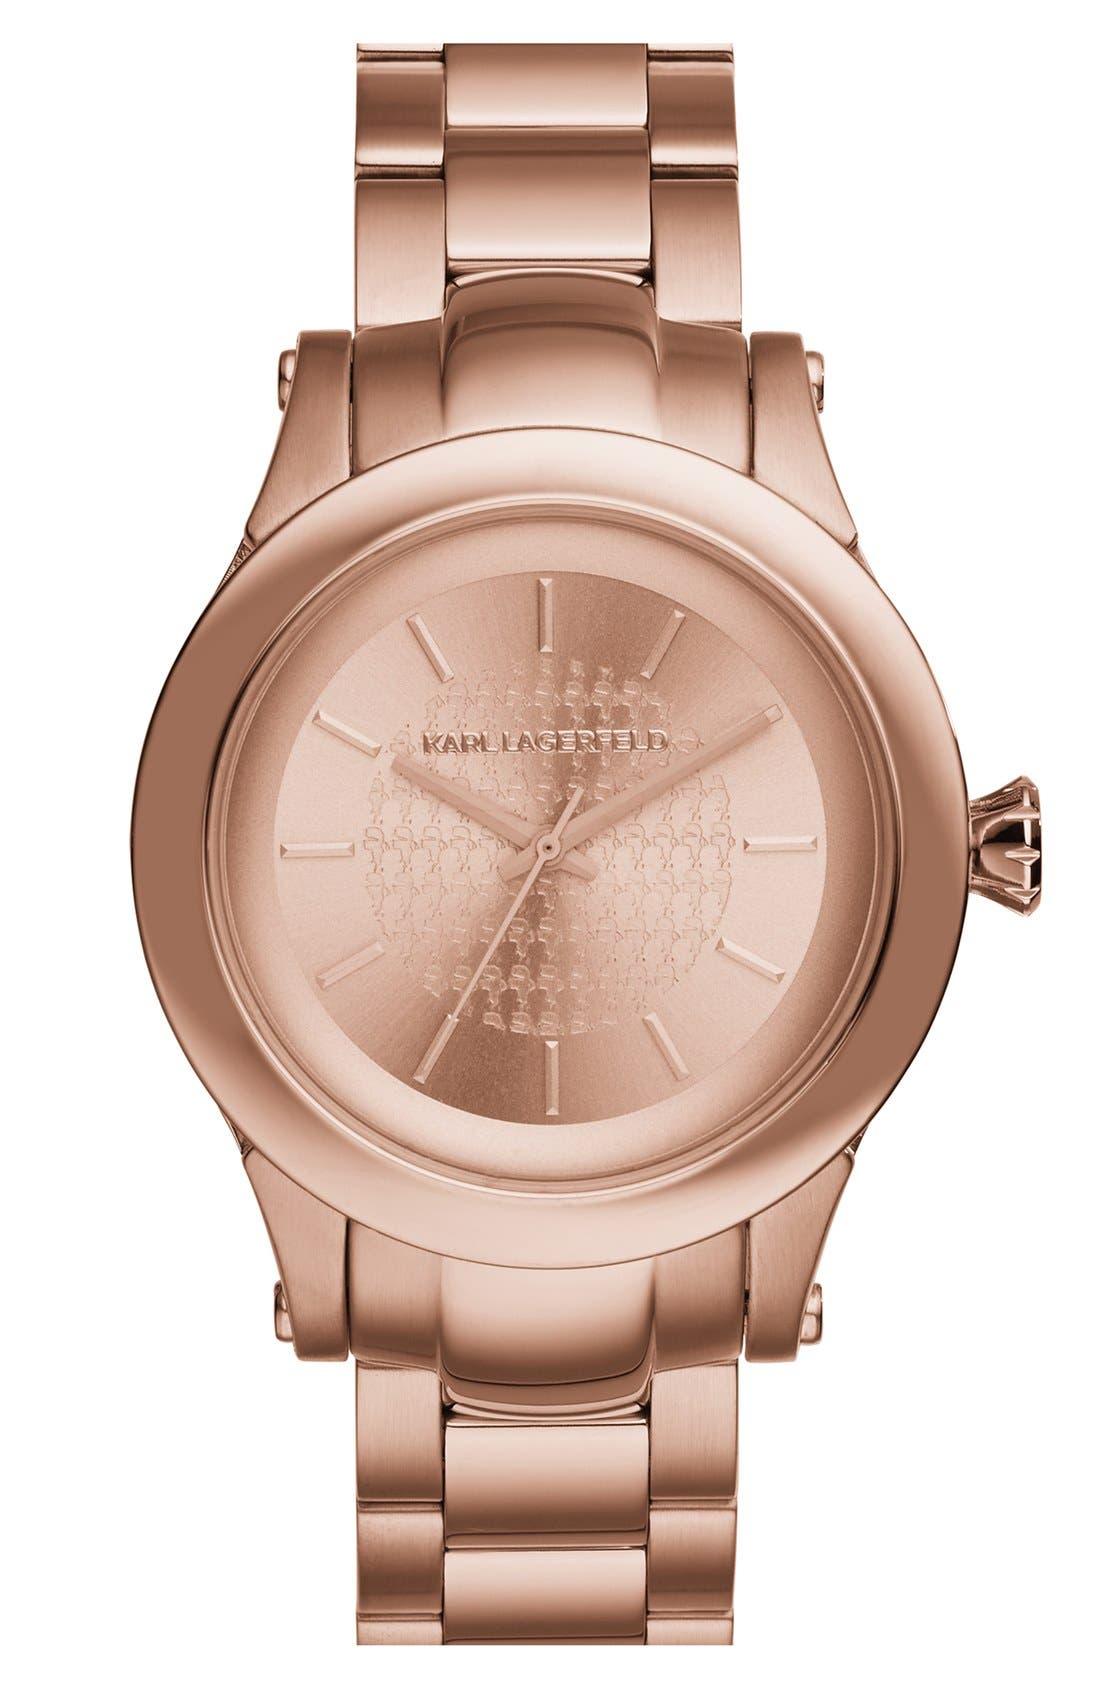 KARL LAGERFELD PARIS KARL LAGERFELD Round Bracelet Watch, 39mm, Main, color, 711